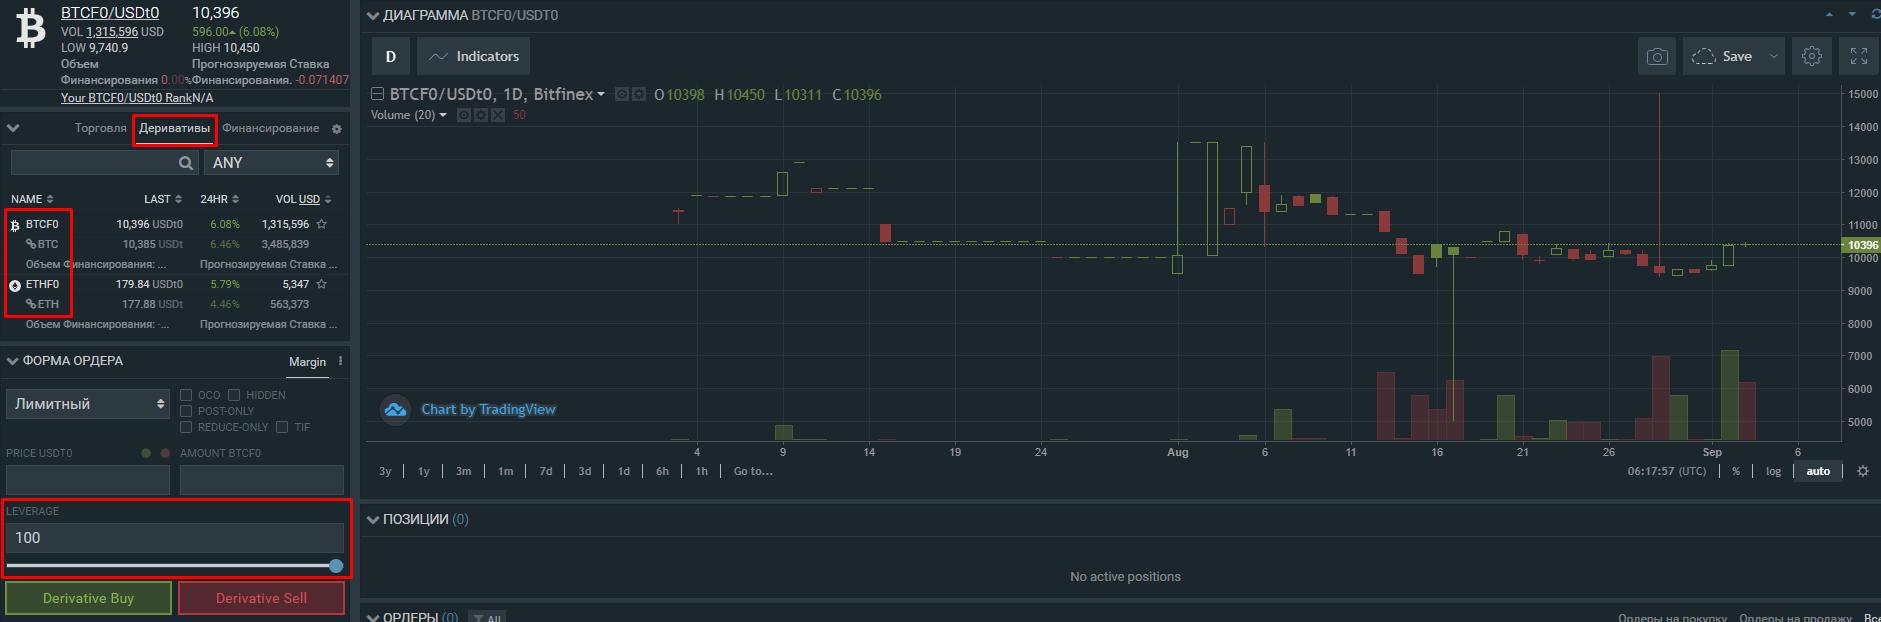 Bitfinex запустила деривативы на базе биткоина и Ethereum с левериджем до 100х